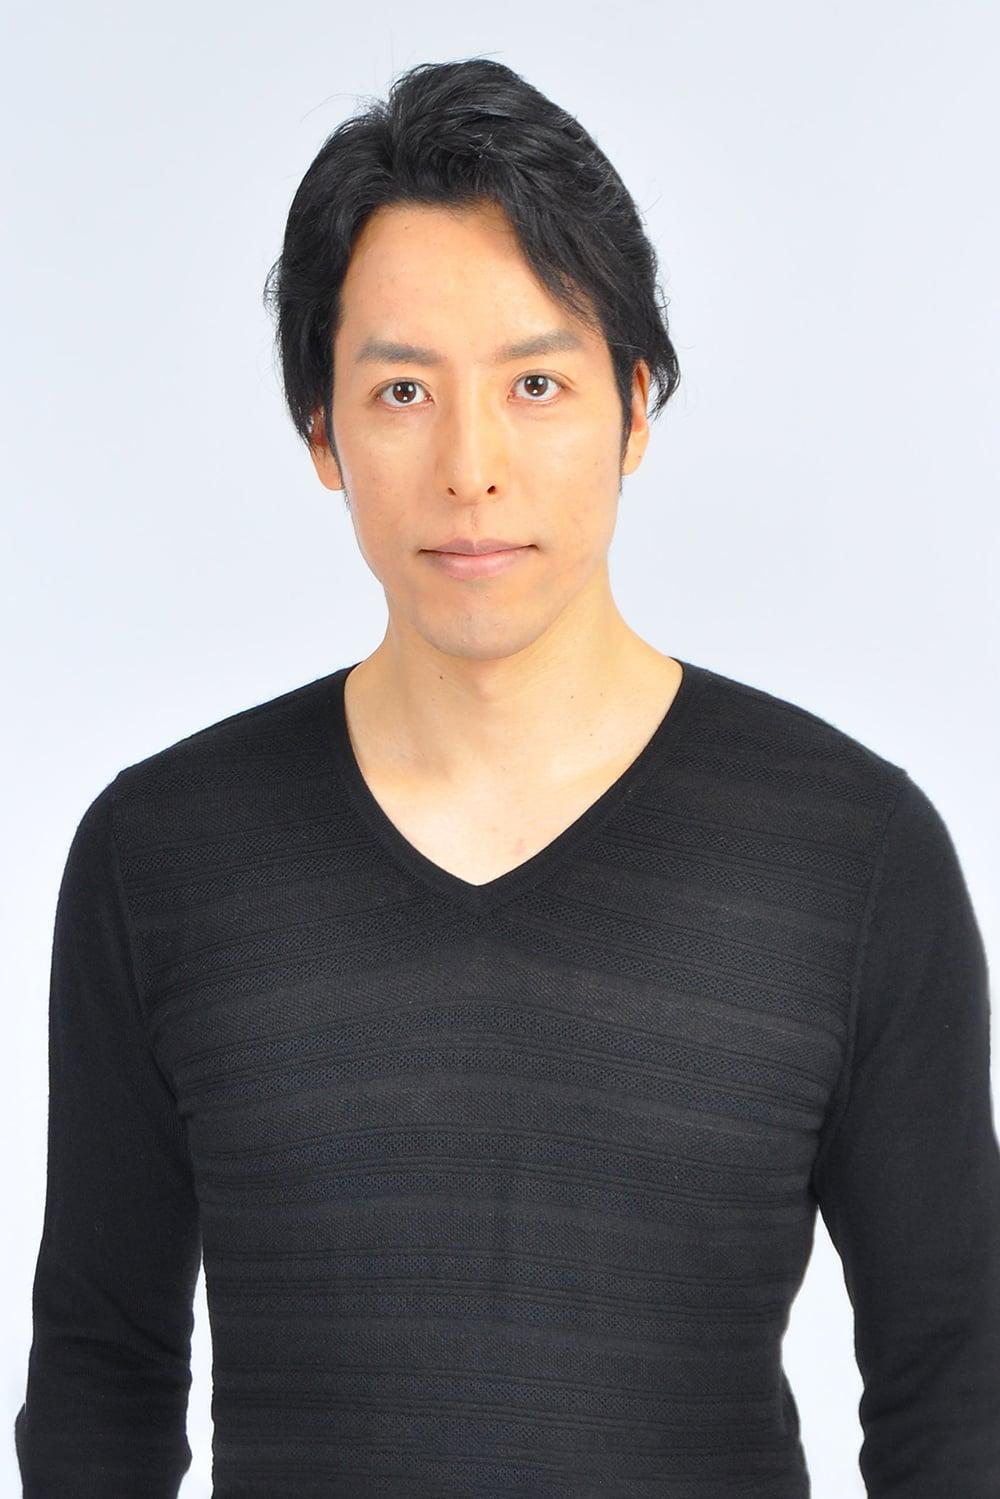 Ryoukan Koyanagi